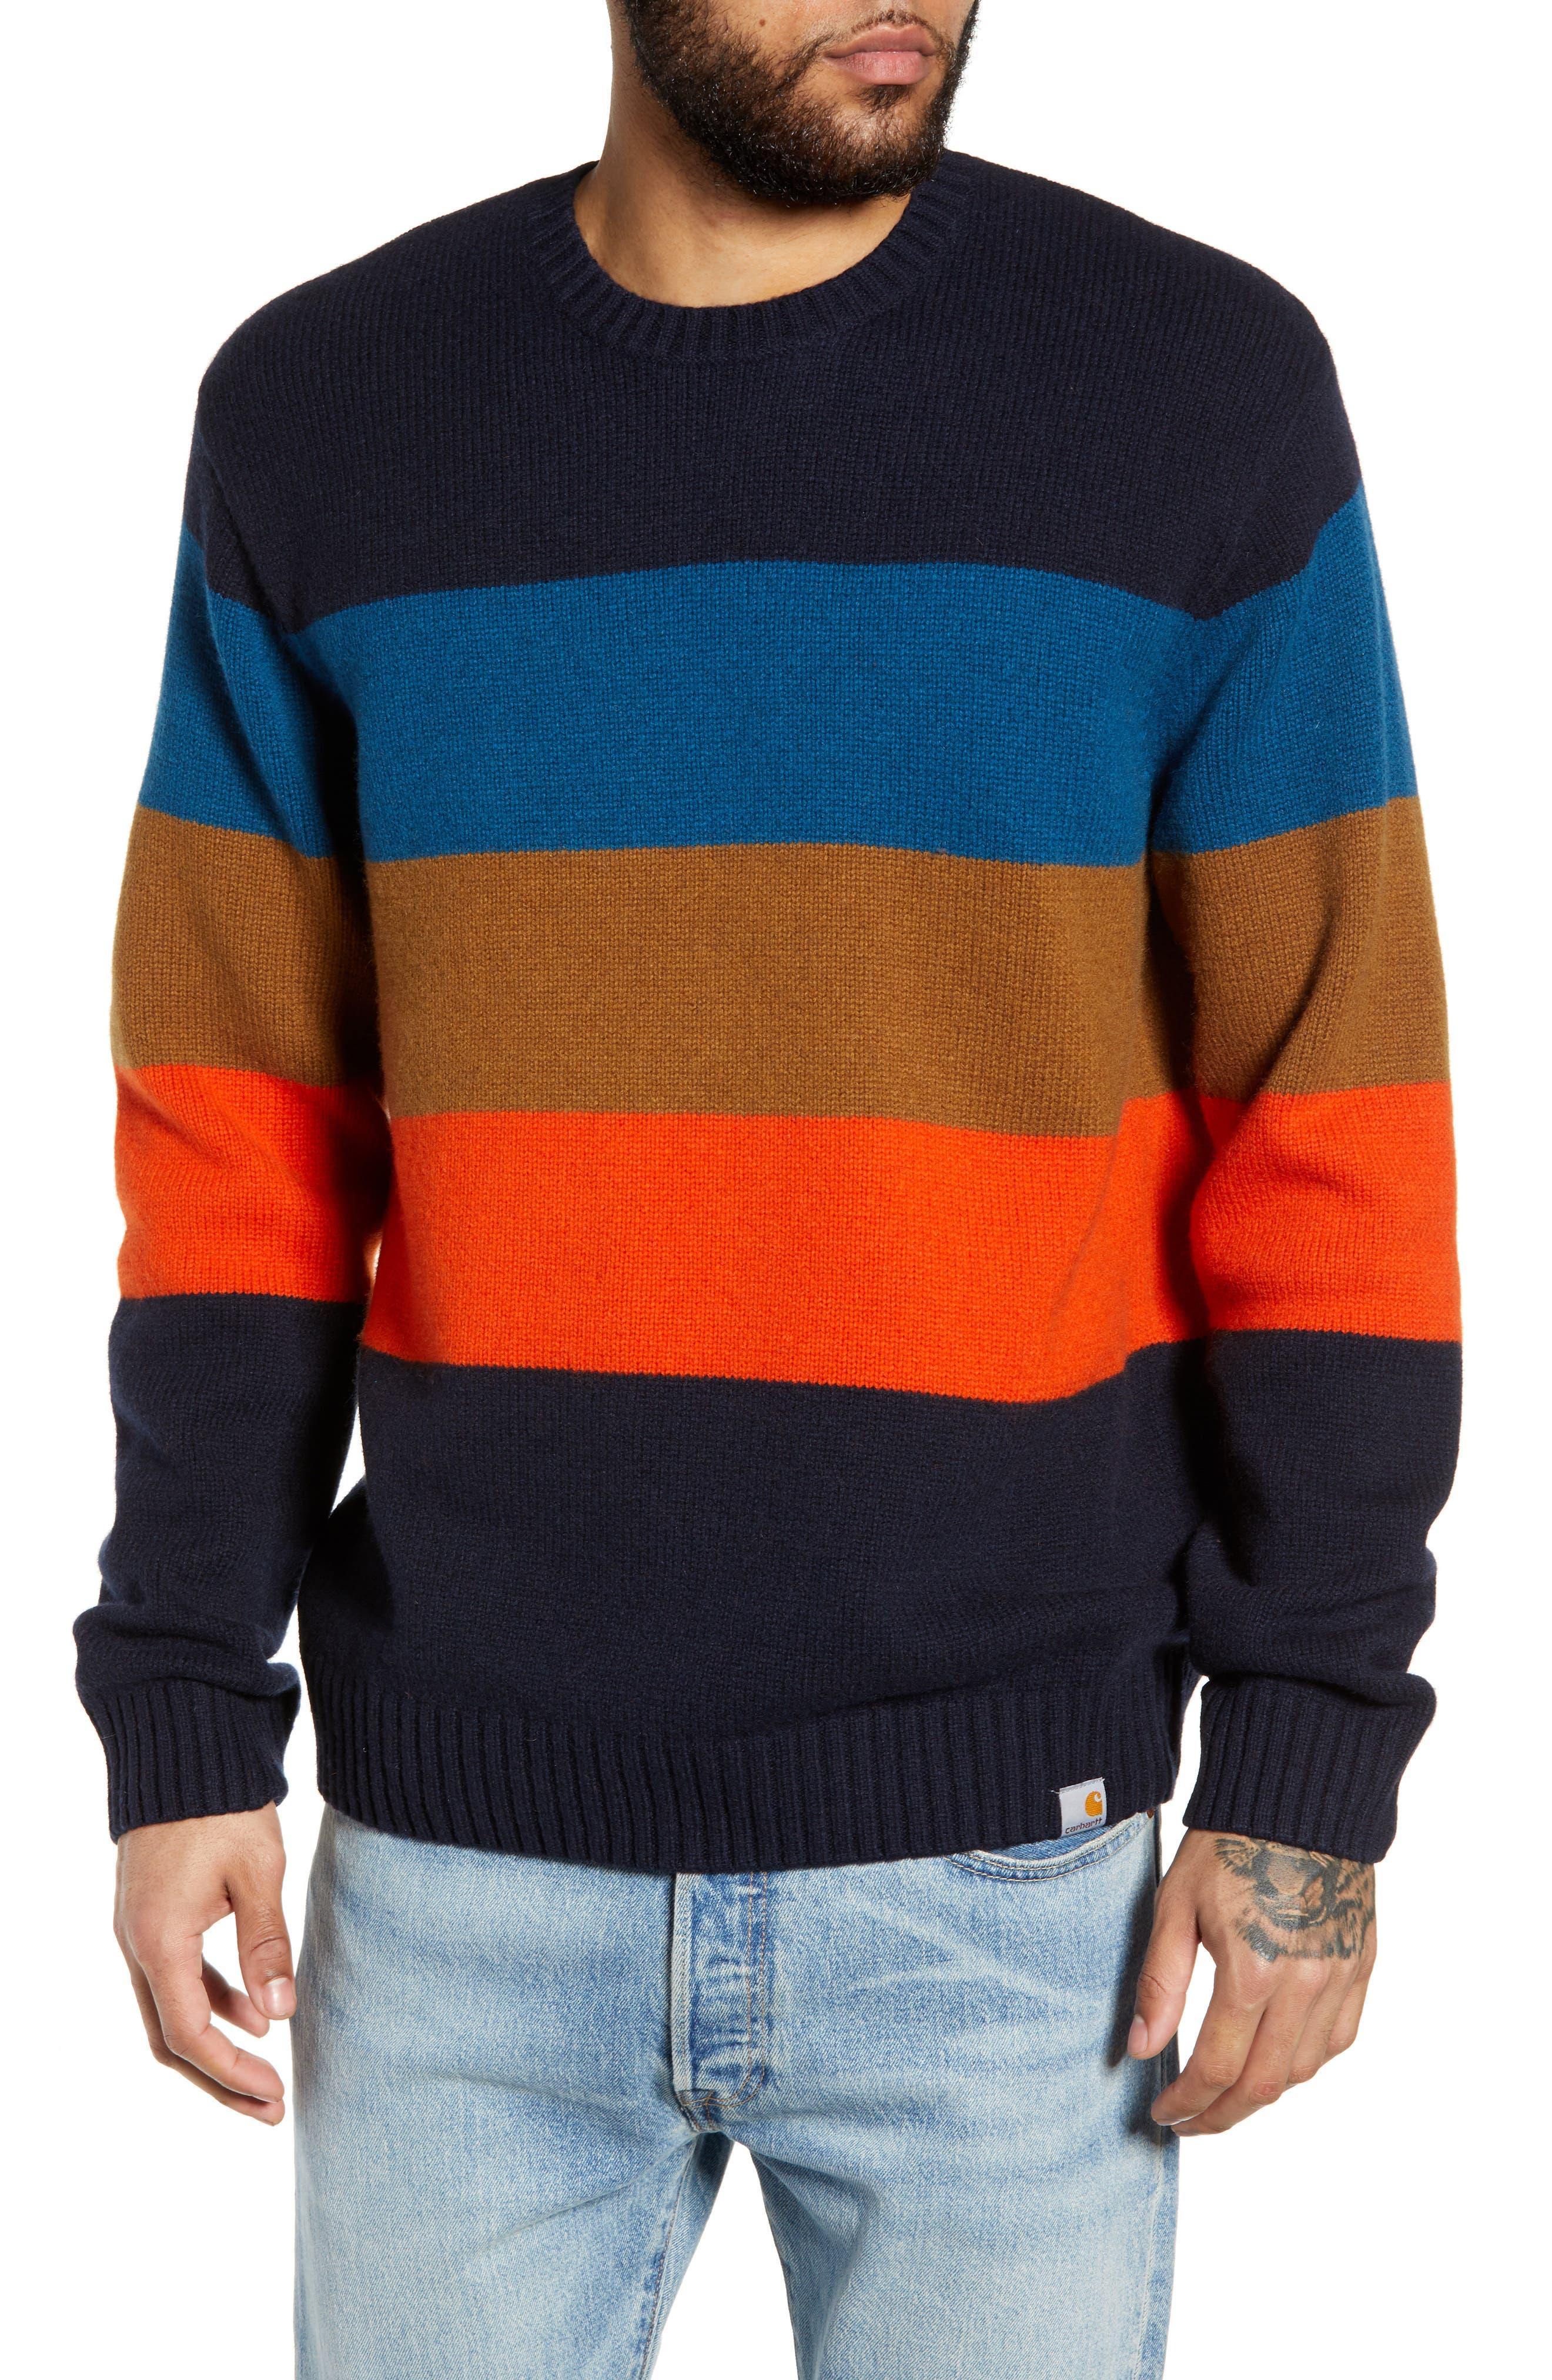 Goldner Stripe Wool Sweater, Main, color, GOLD STRIPE DARK NAVY